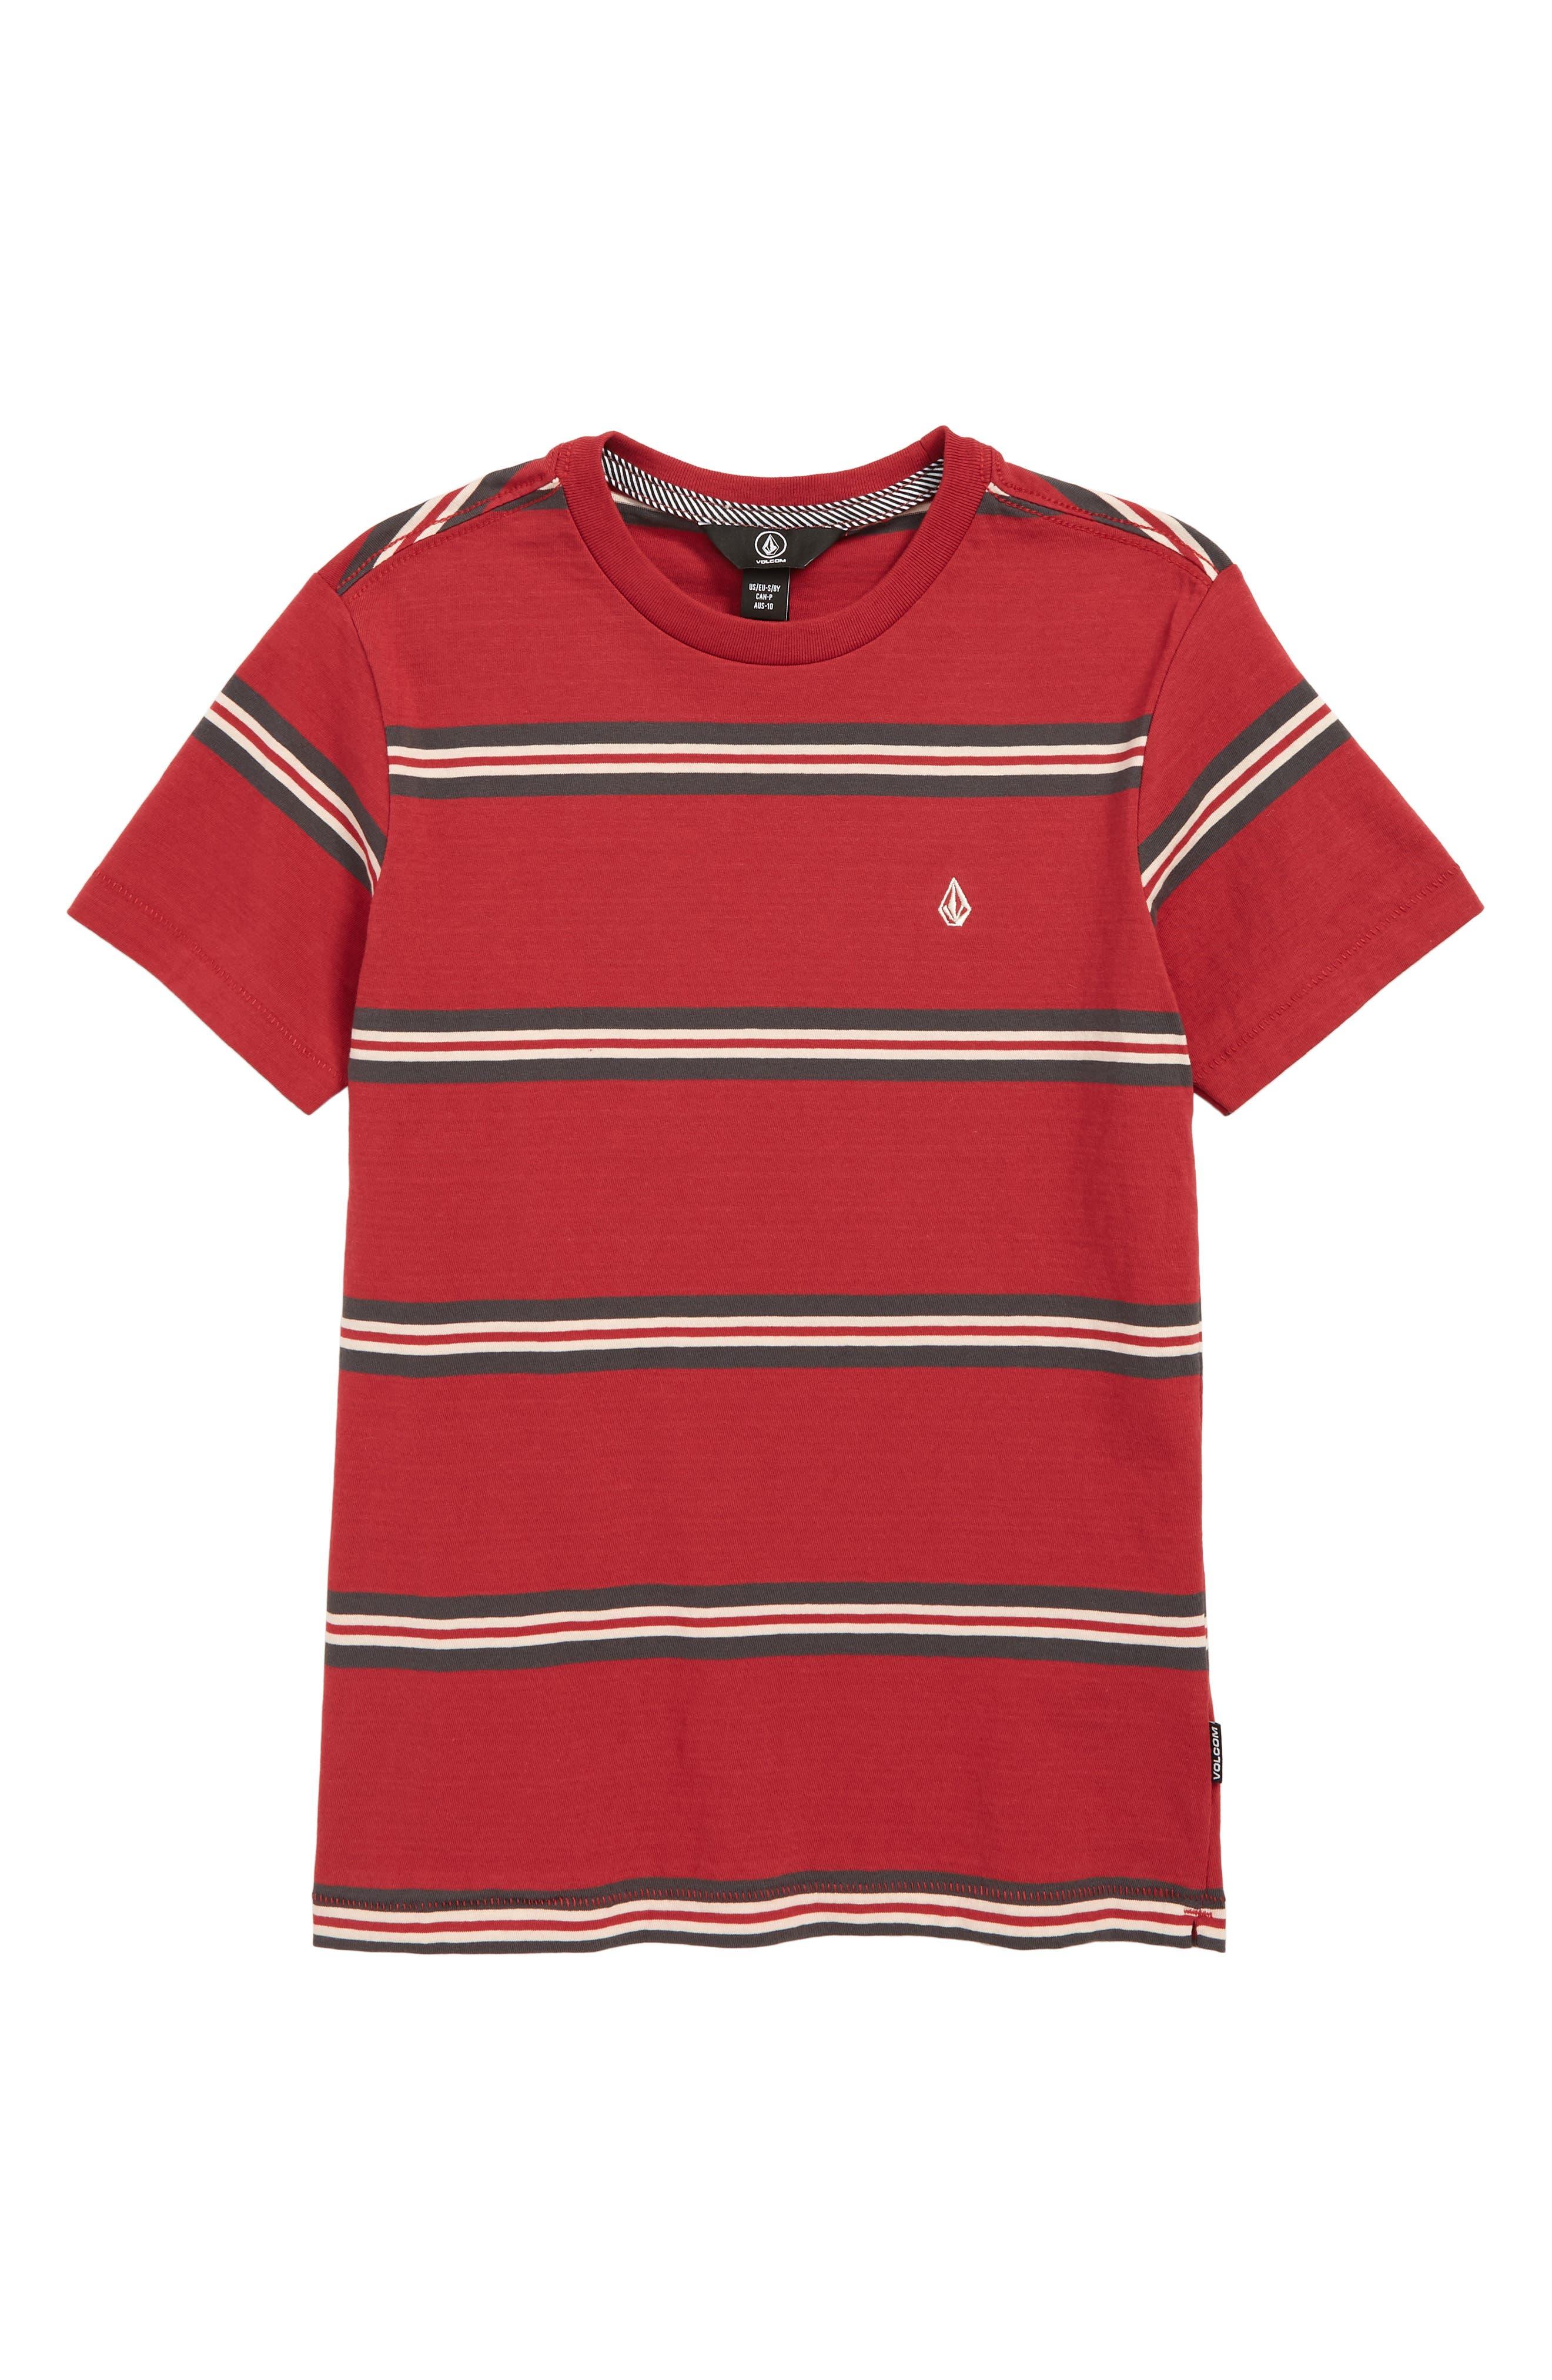 VOLCOM,                             Beauville Stripe T-Shirt,                             Main thumbnail 1, color,                             BURGUNDY